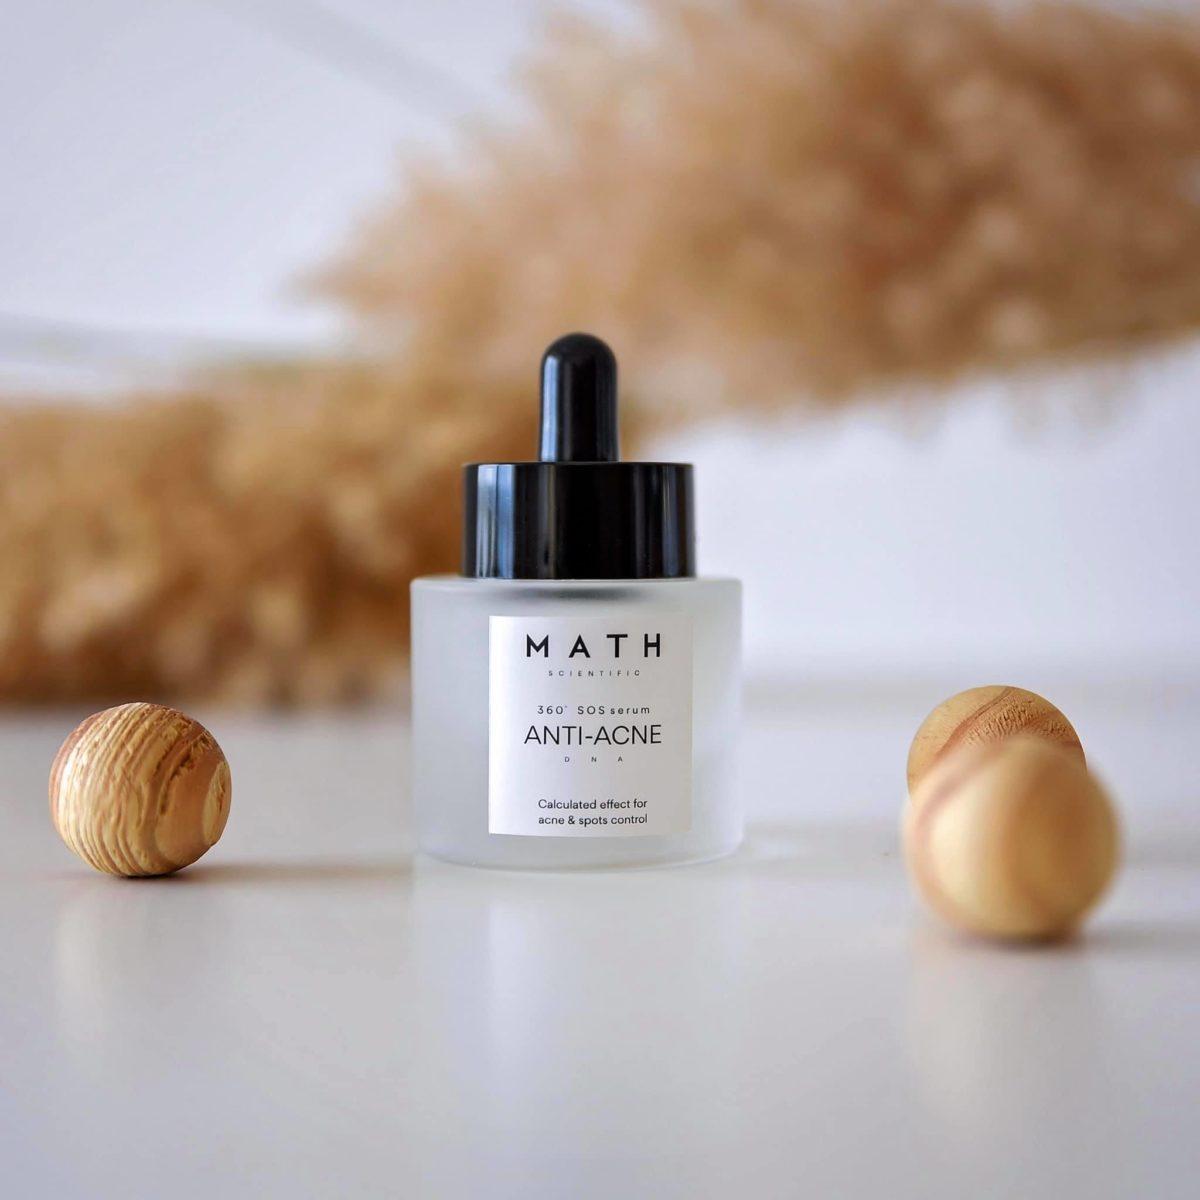 Anti-Acne Serum benefits